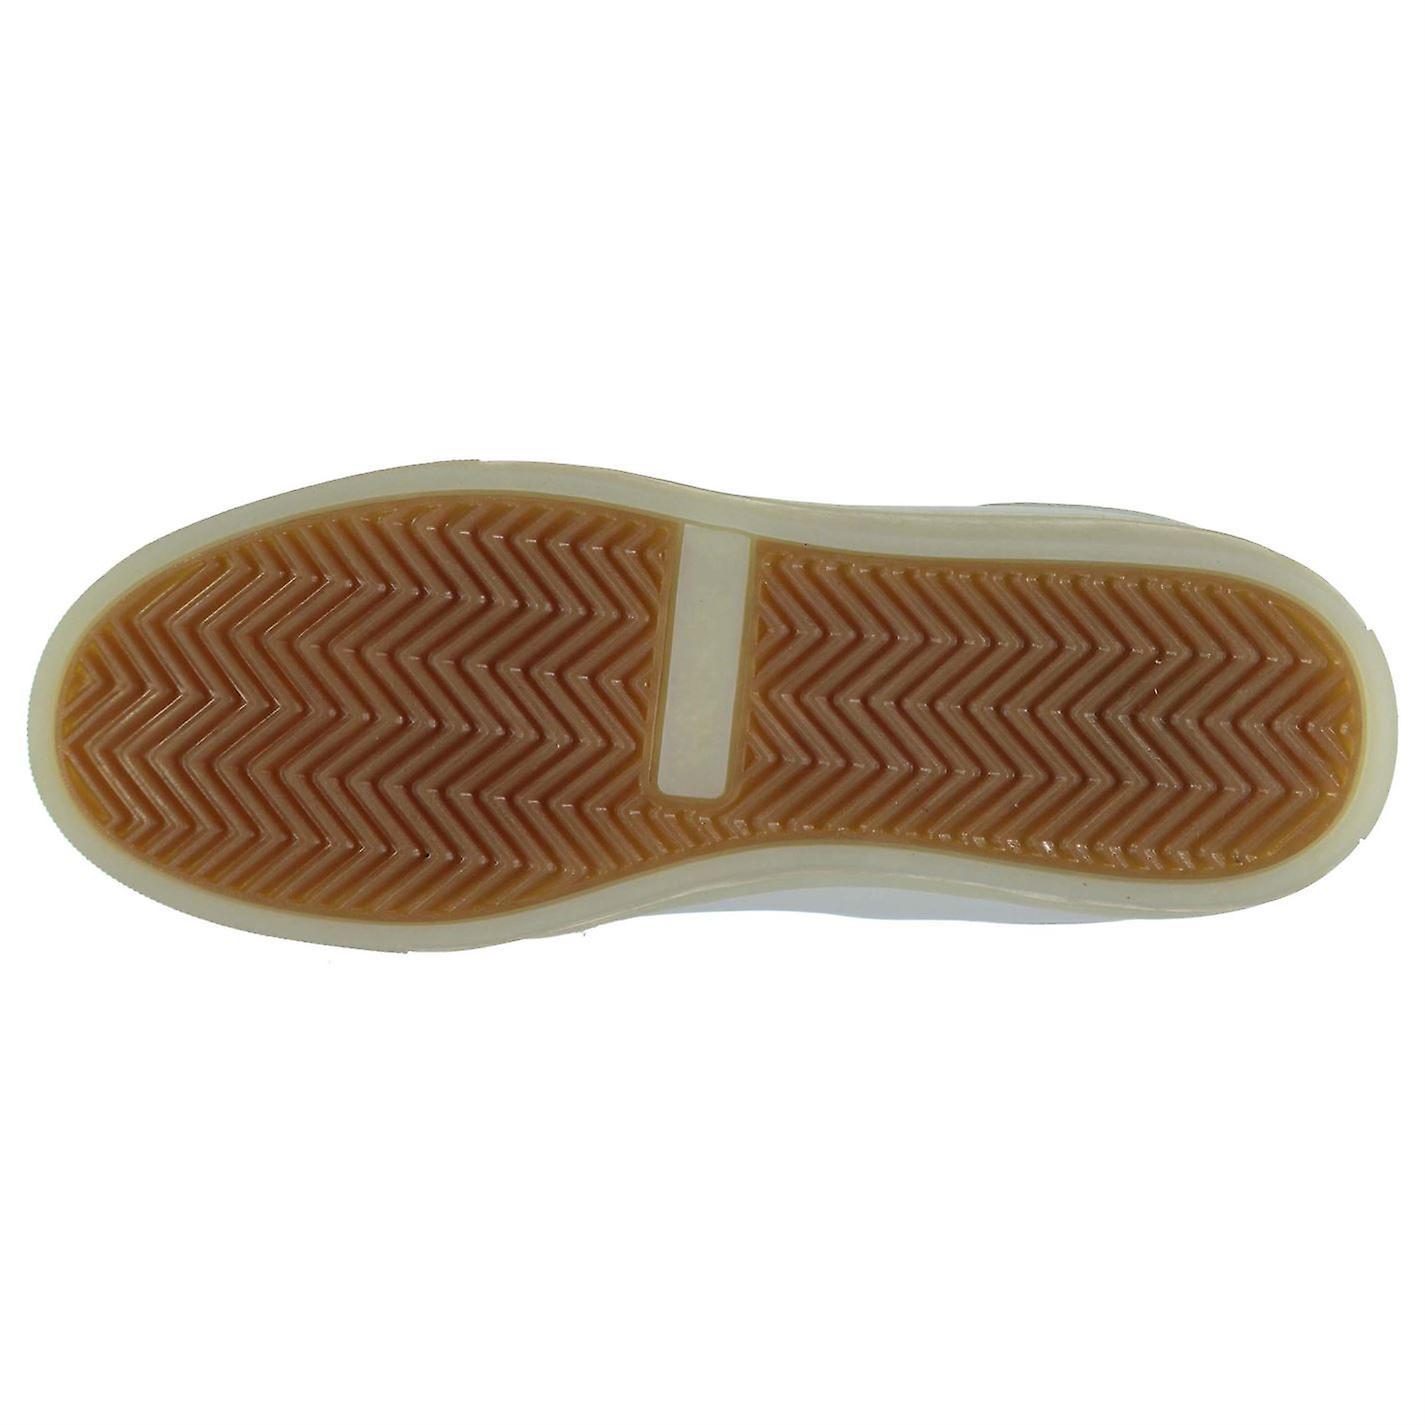 Beppi Mens Moonlight Trainers Lace Up scarpe USB Flashing Sole Ventilation   Raccomandazione popolare    Gentiluomo/Signora Scarpa